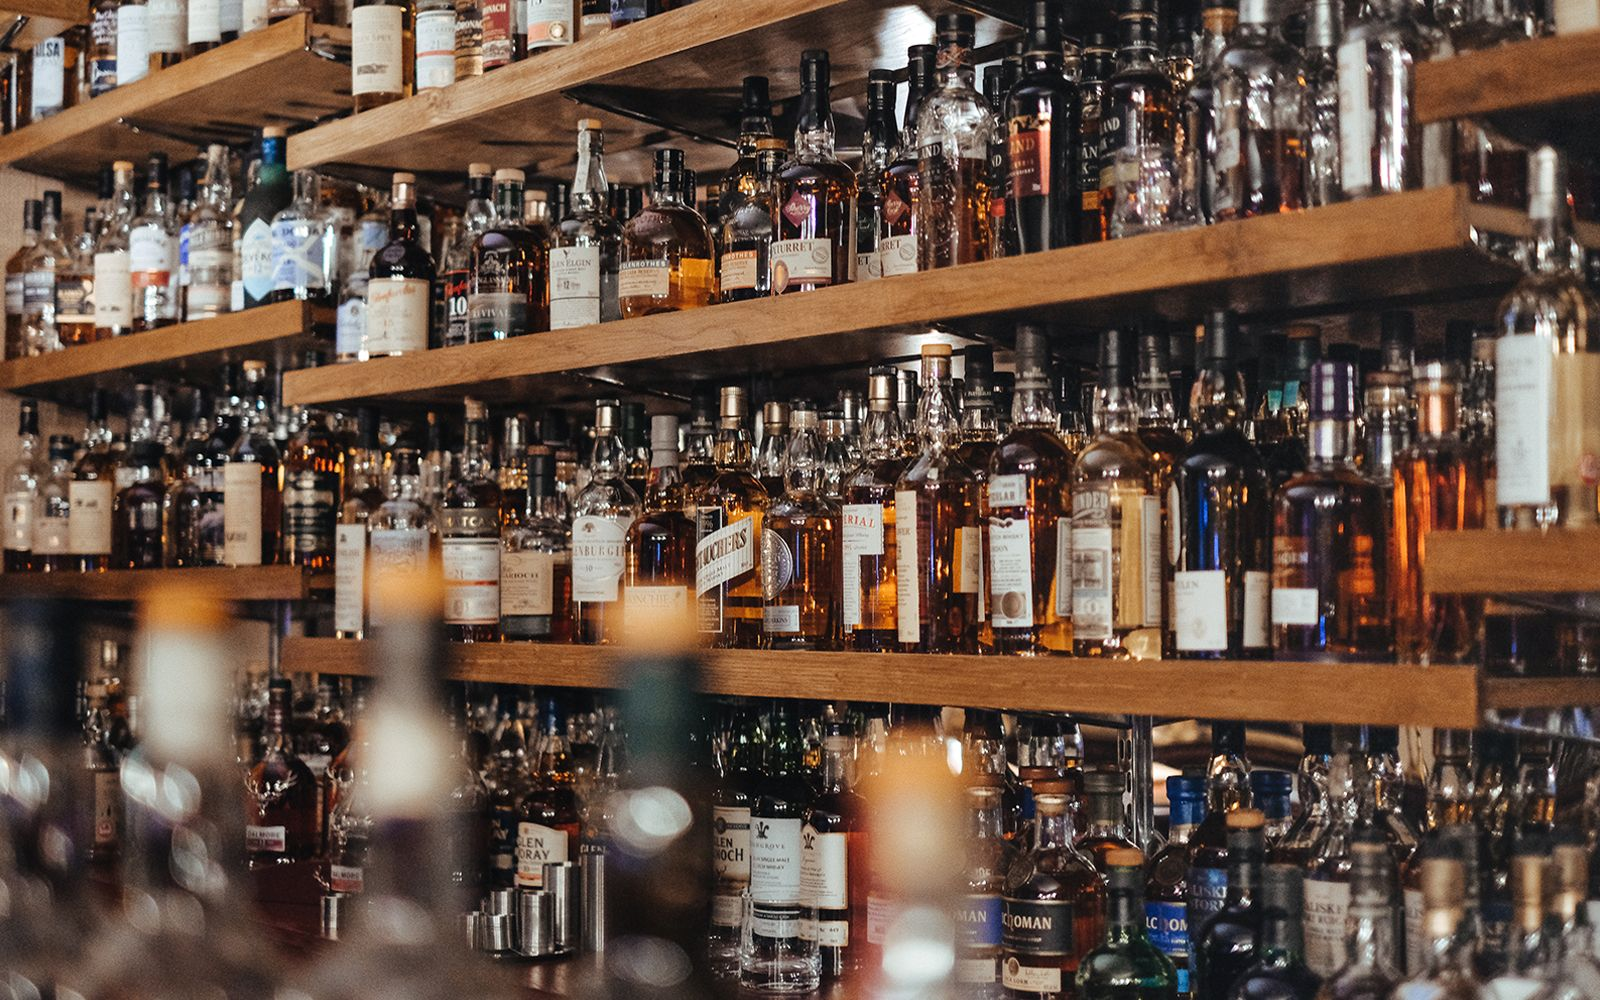 4 Smokin' Peated Whiskies To Start 2018 With